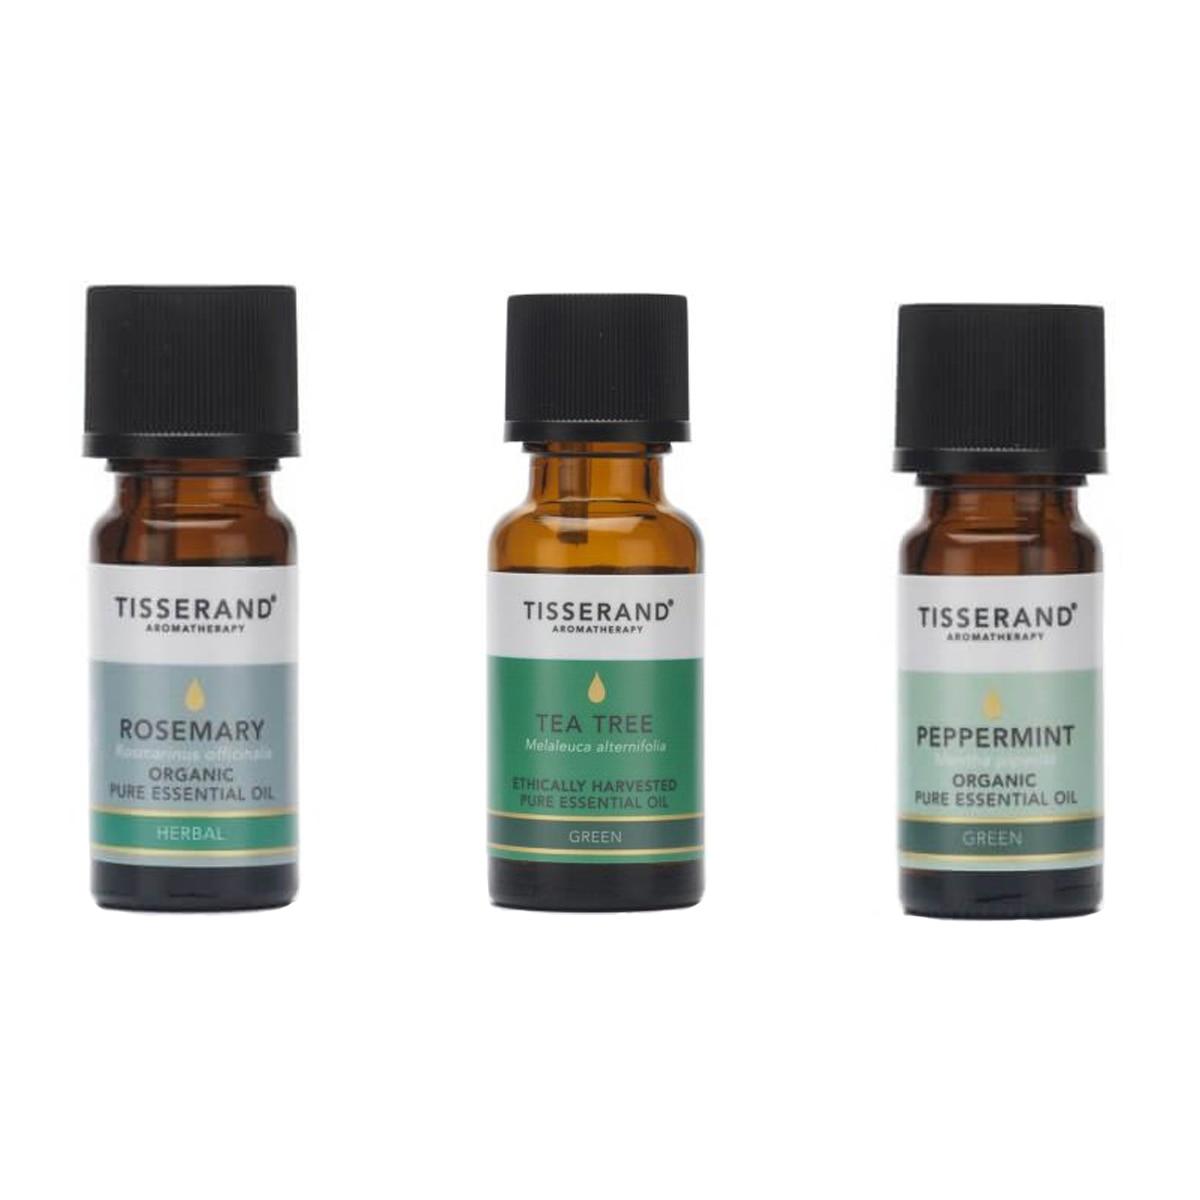 Varice tratamentul cu ulei de cedru